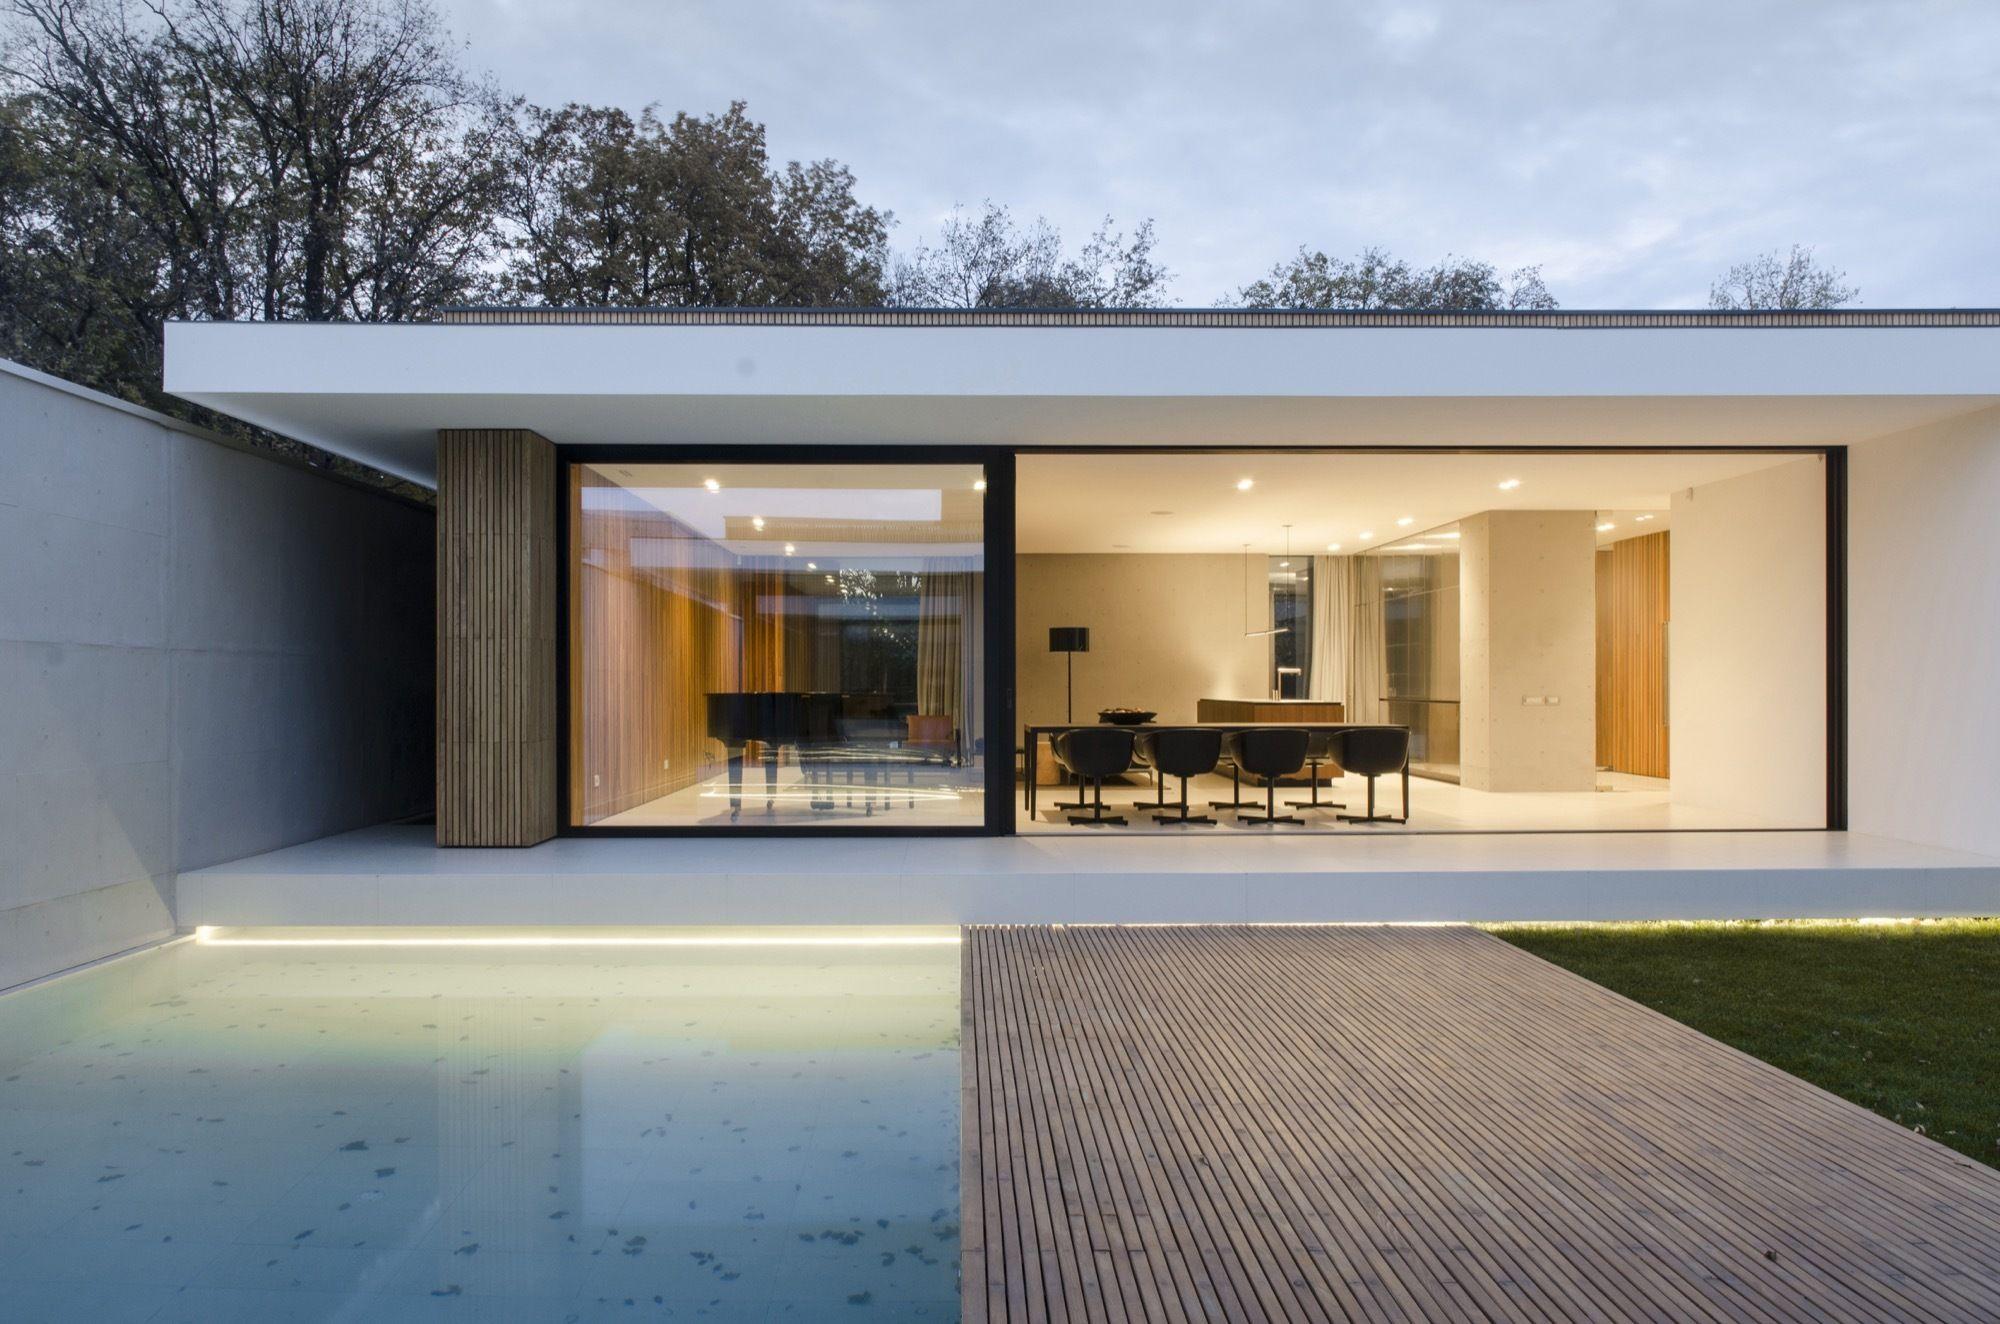 Galería de Casa Piano / LINE architects - 2 | Max liebermann ...